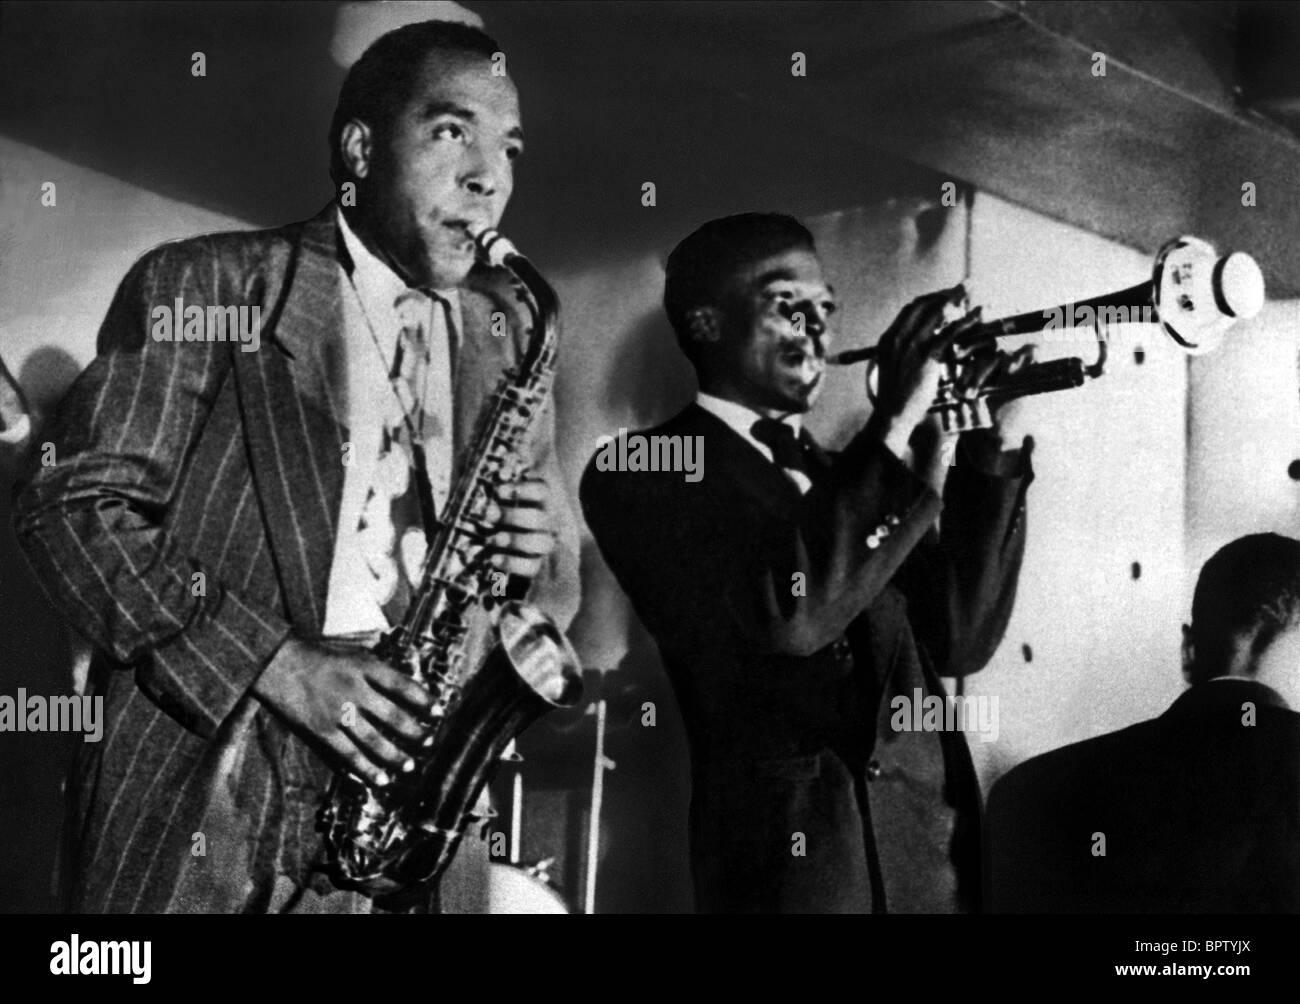 Miles Davis - Jazz Masters